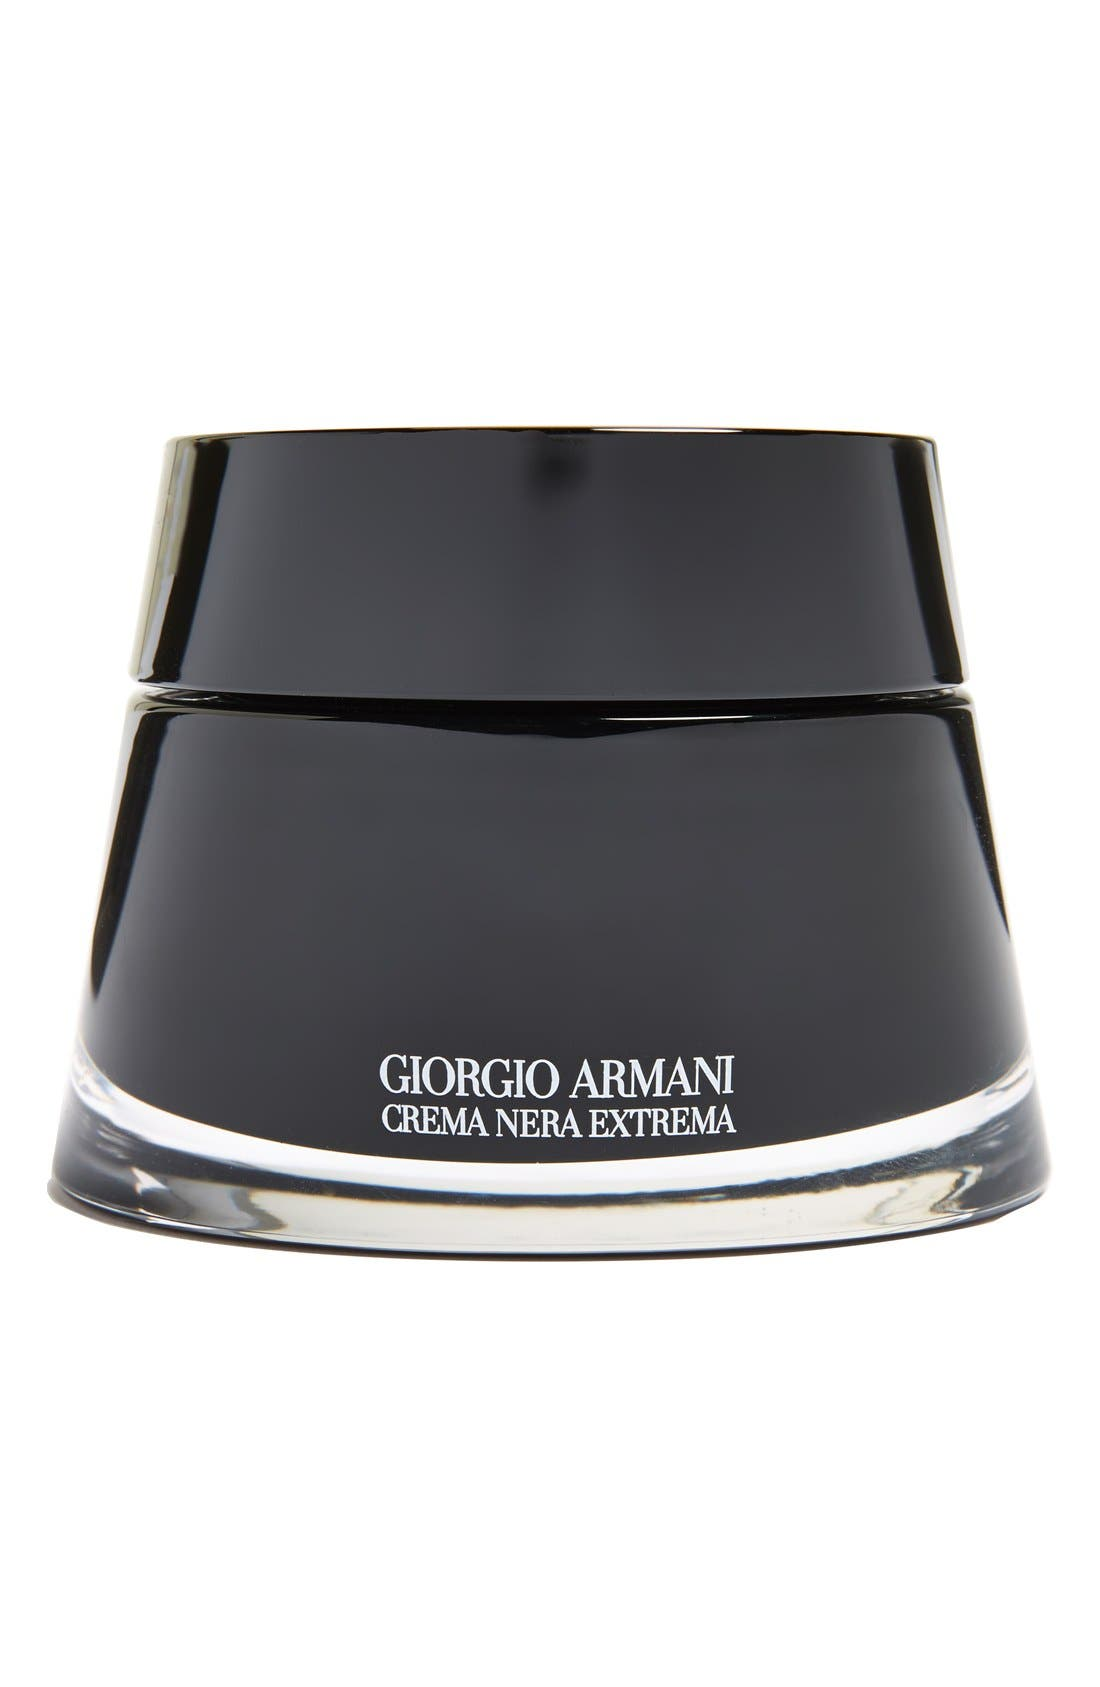 Crema Nera Extrema Light Cream, Main, color, NO COLOR